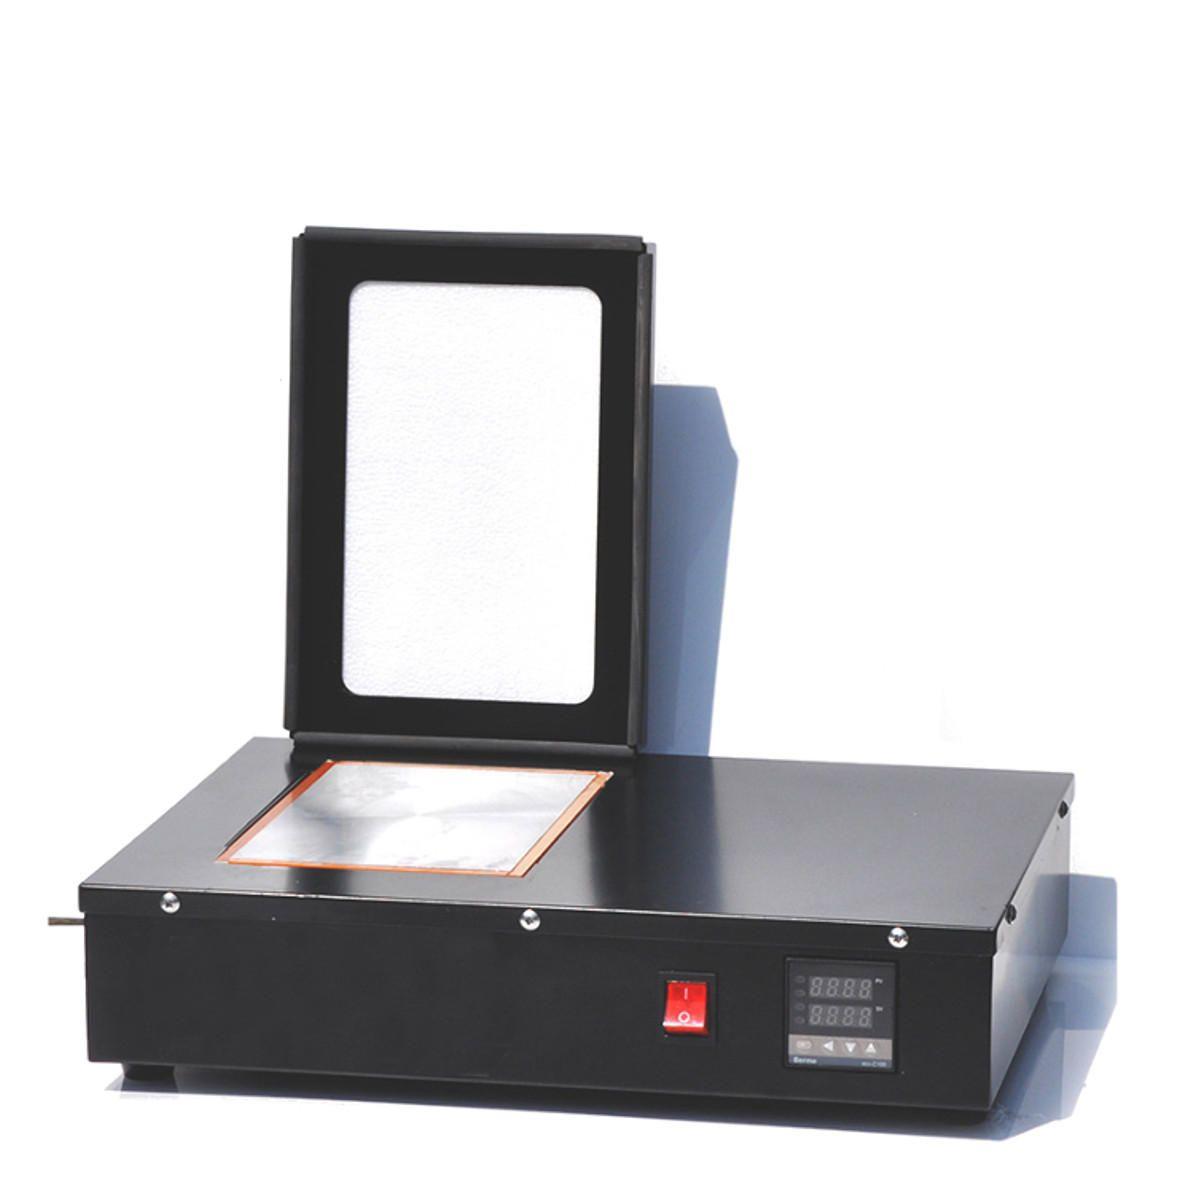 FS 06 Nitrogen Frozen Separator LCD Separating Machine for 9inch Mobile Phone